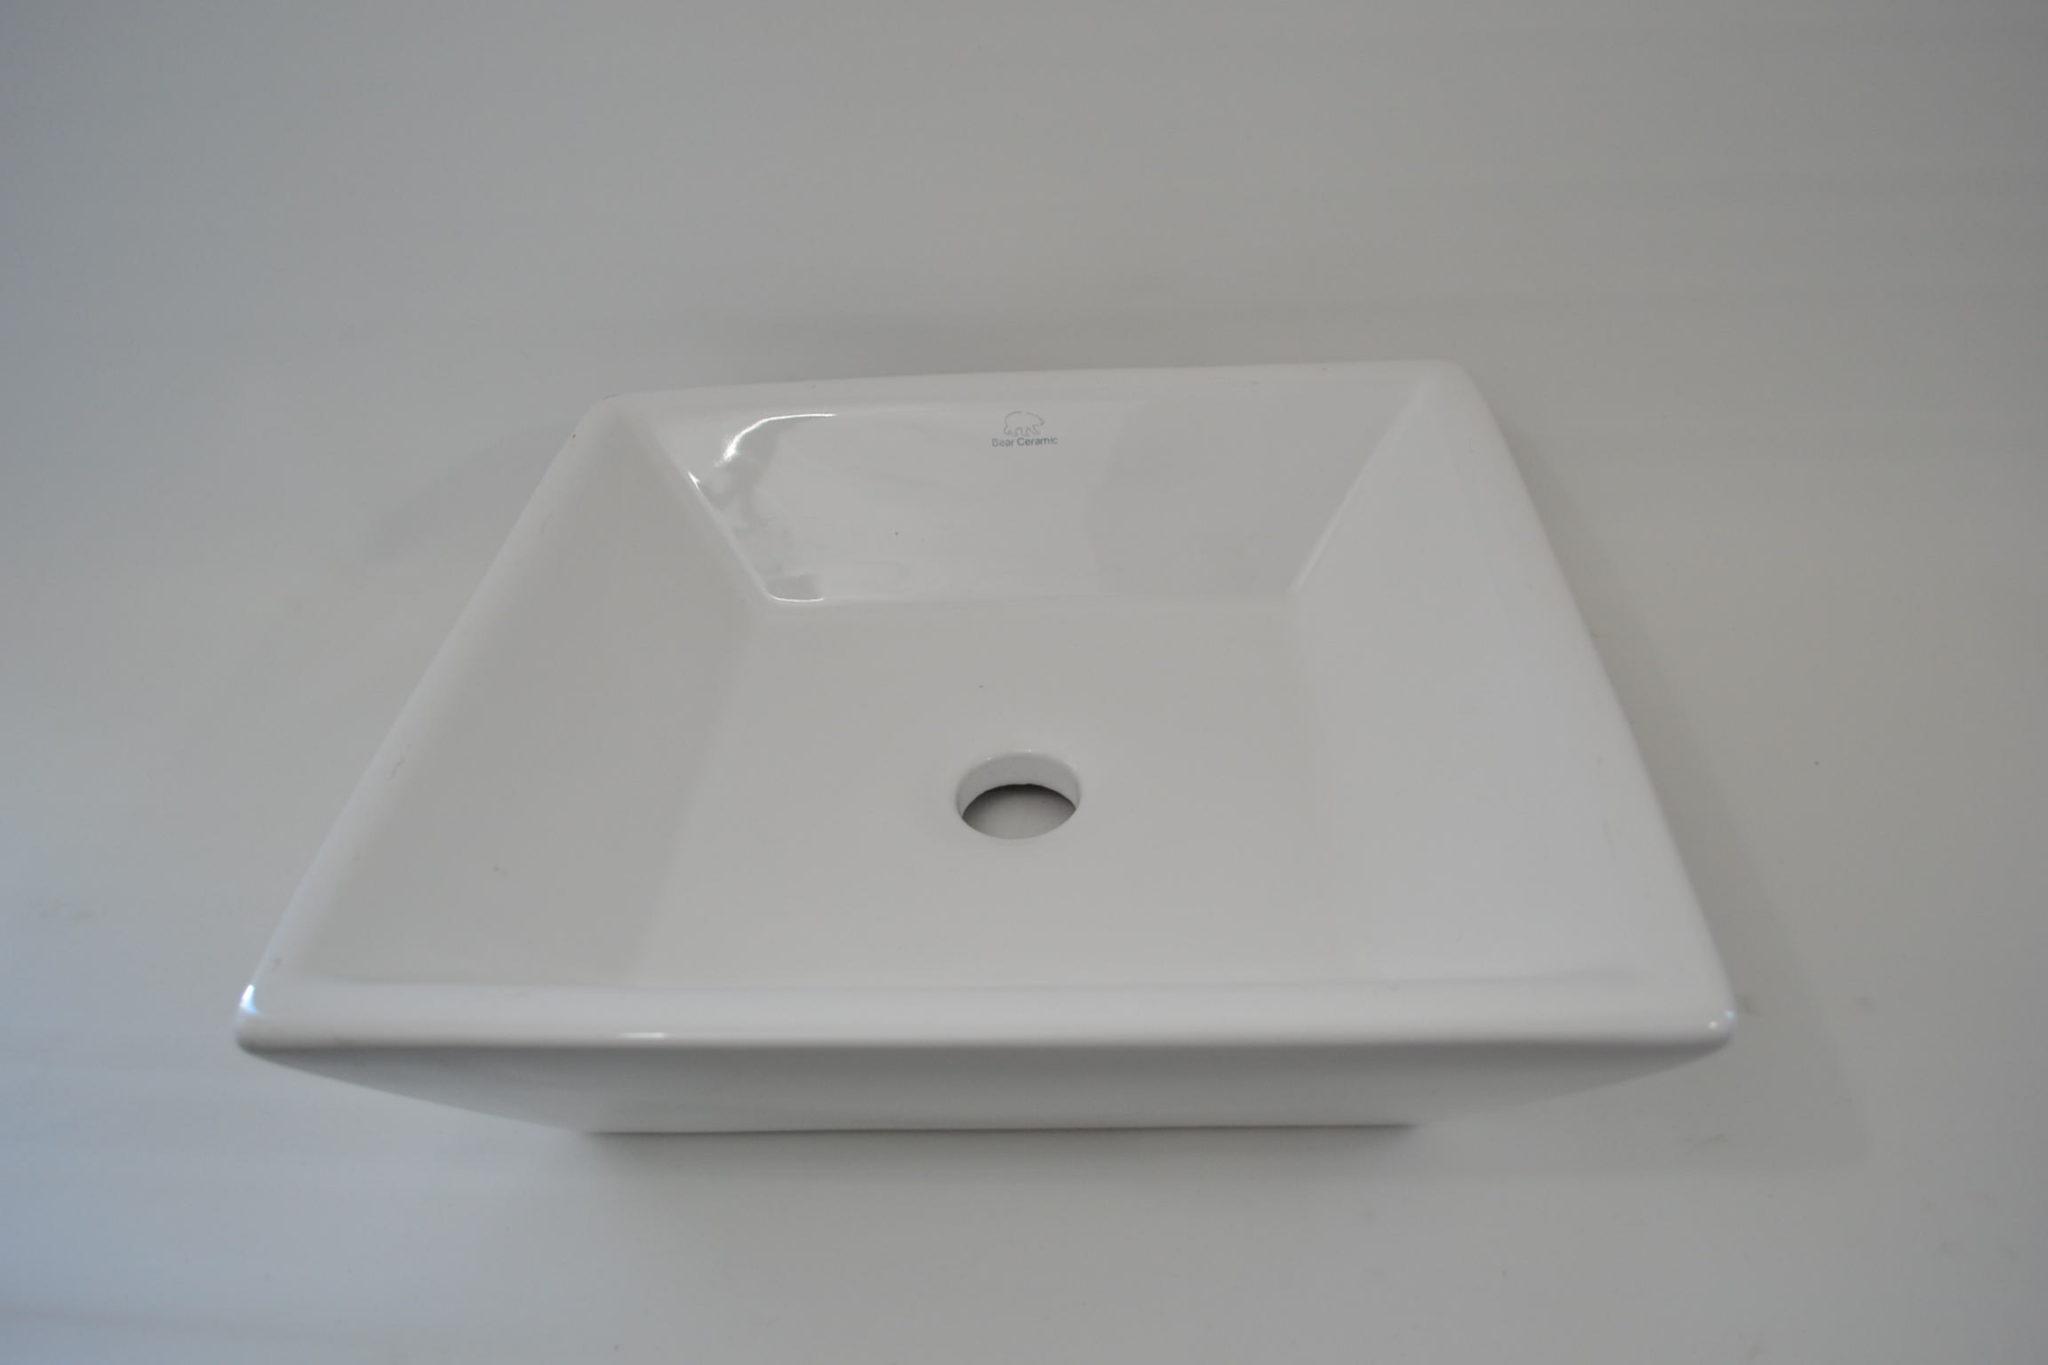 Low Profile Square - $79